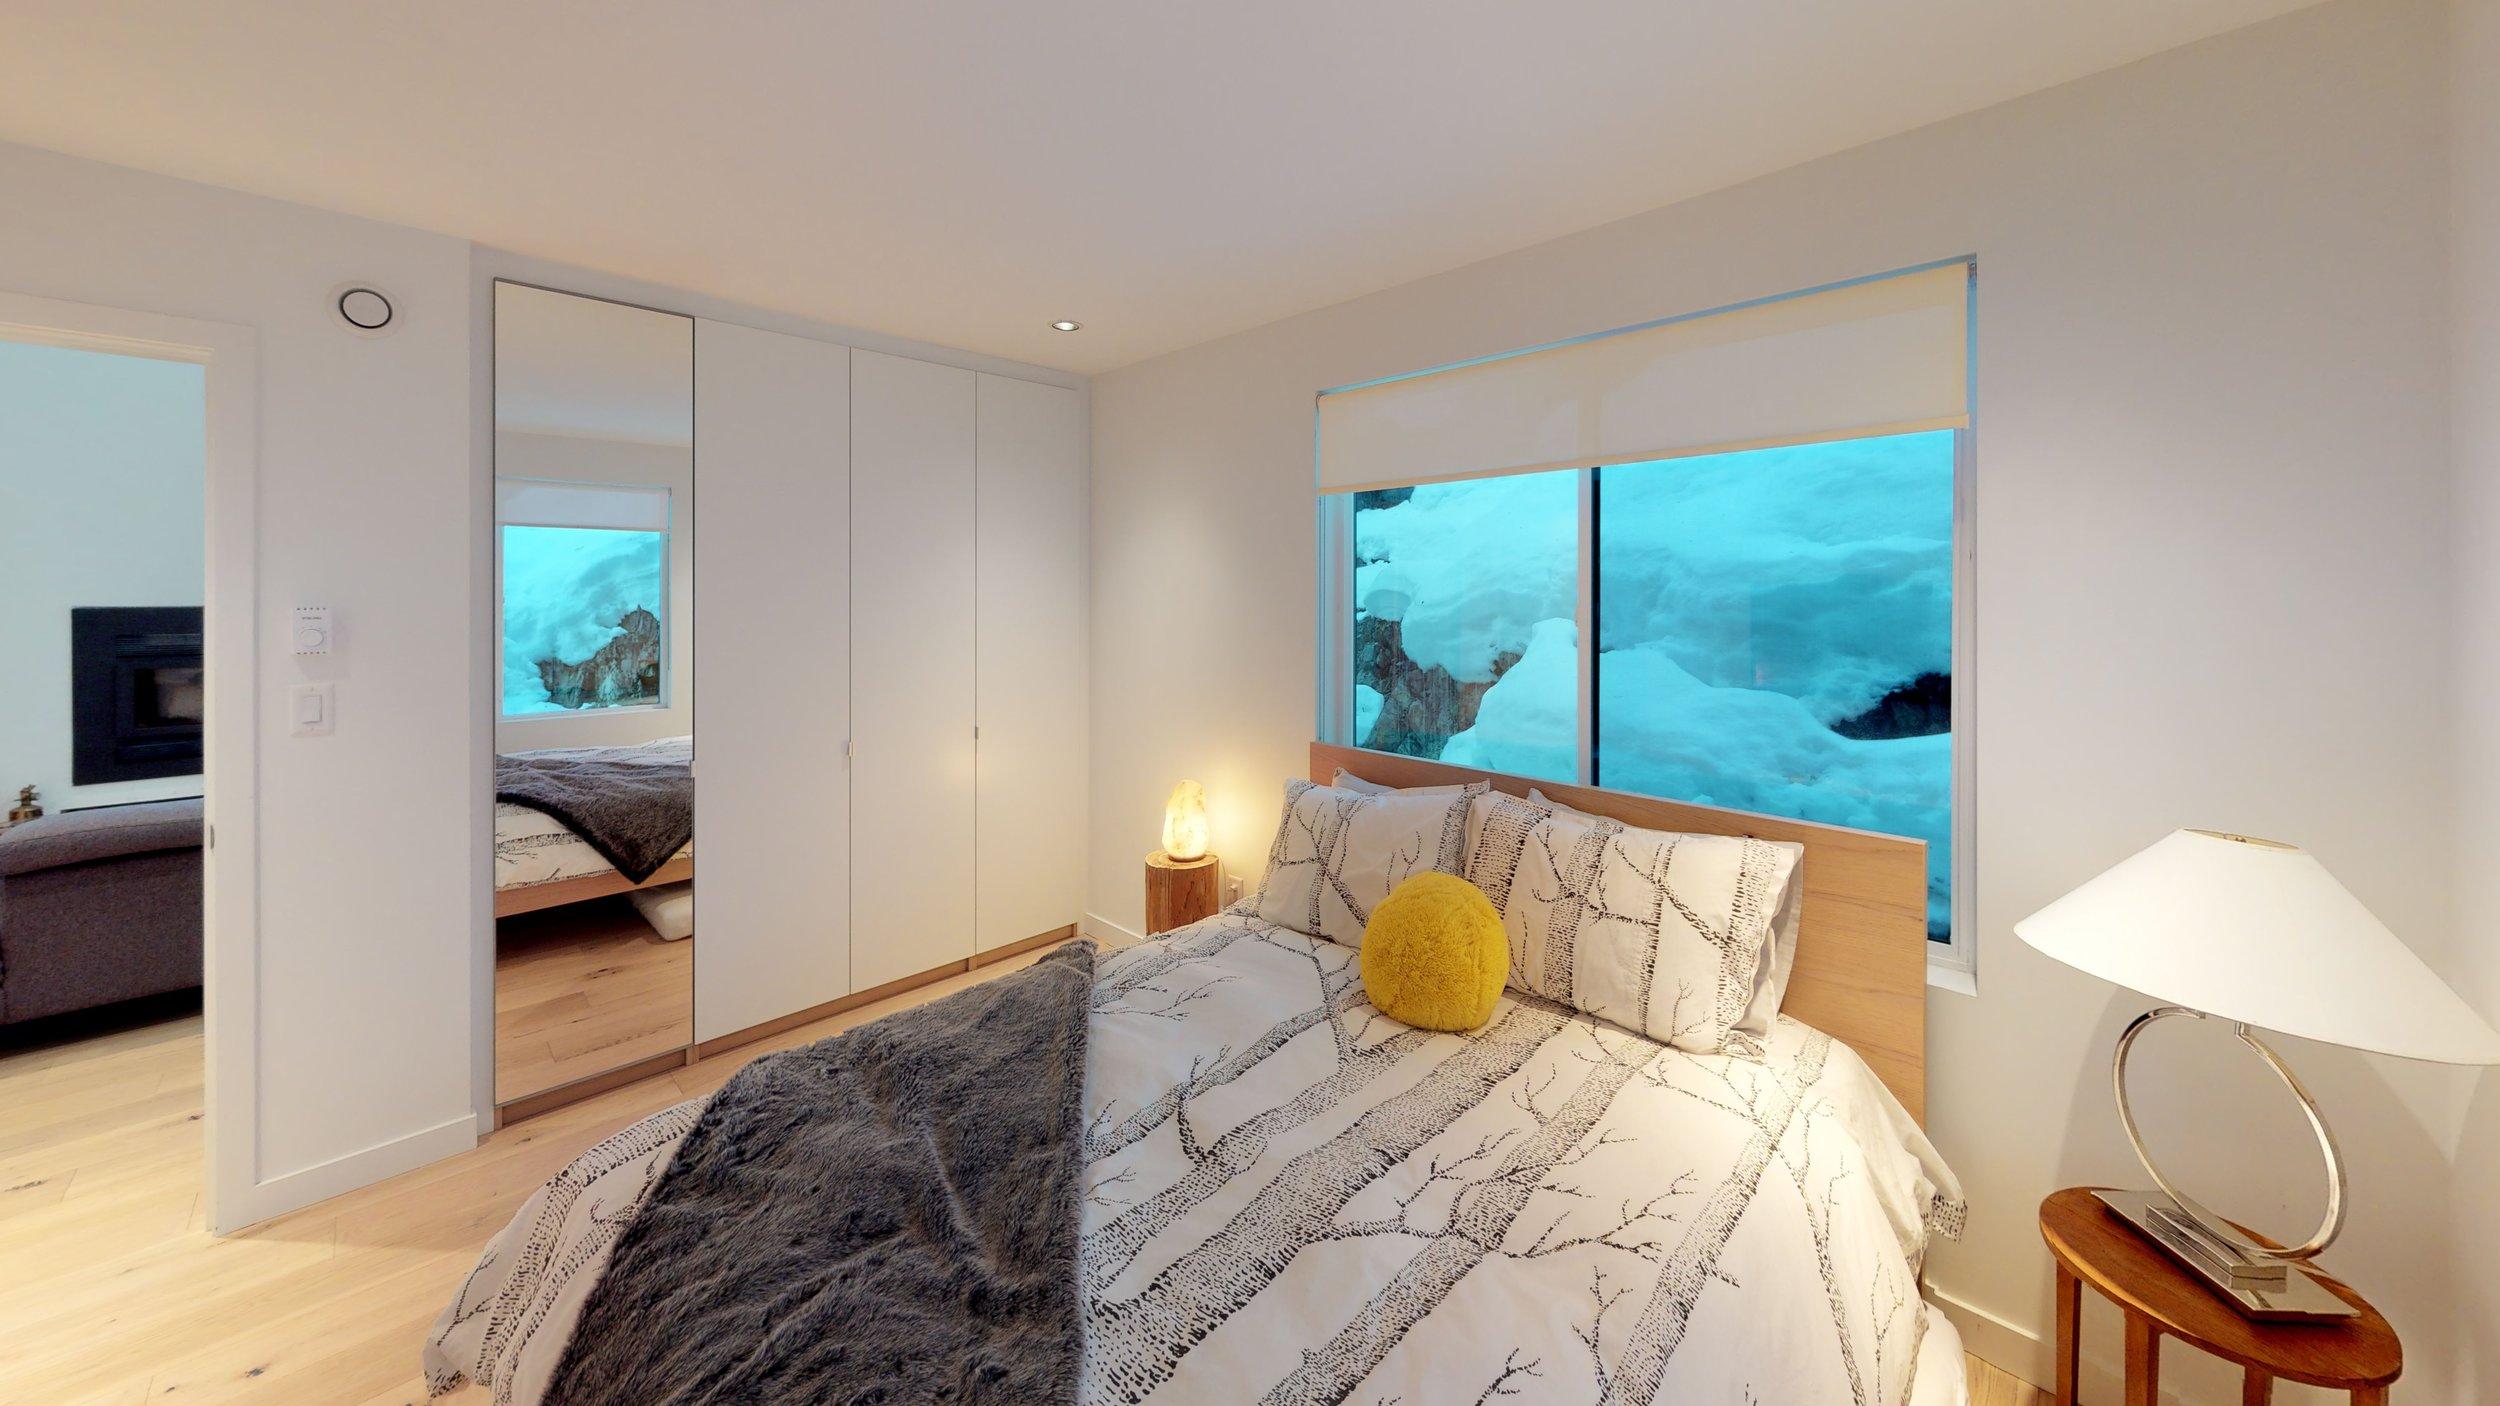 10 Bedroom-3(1).jpg